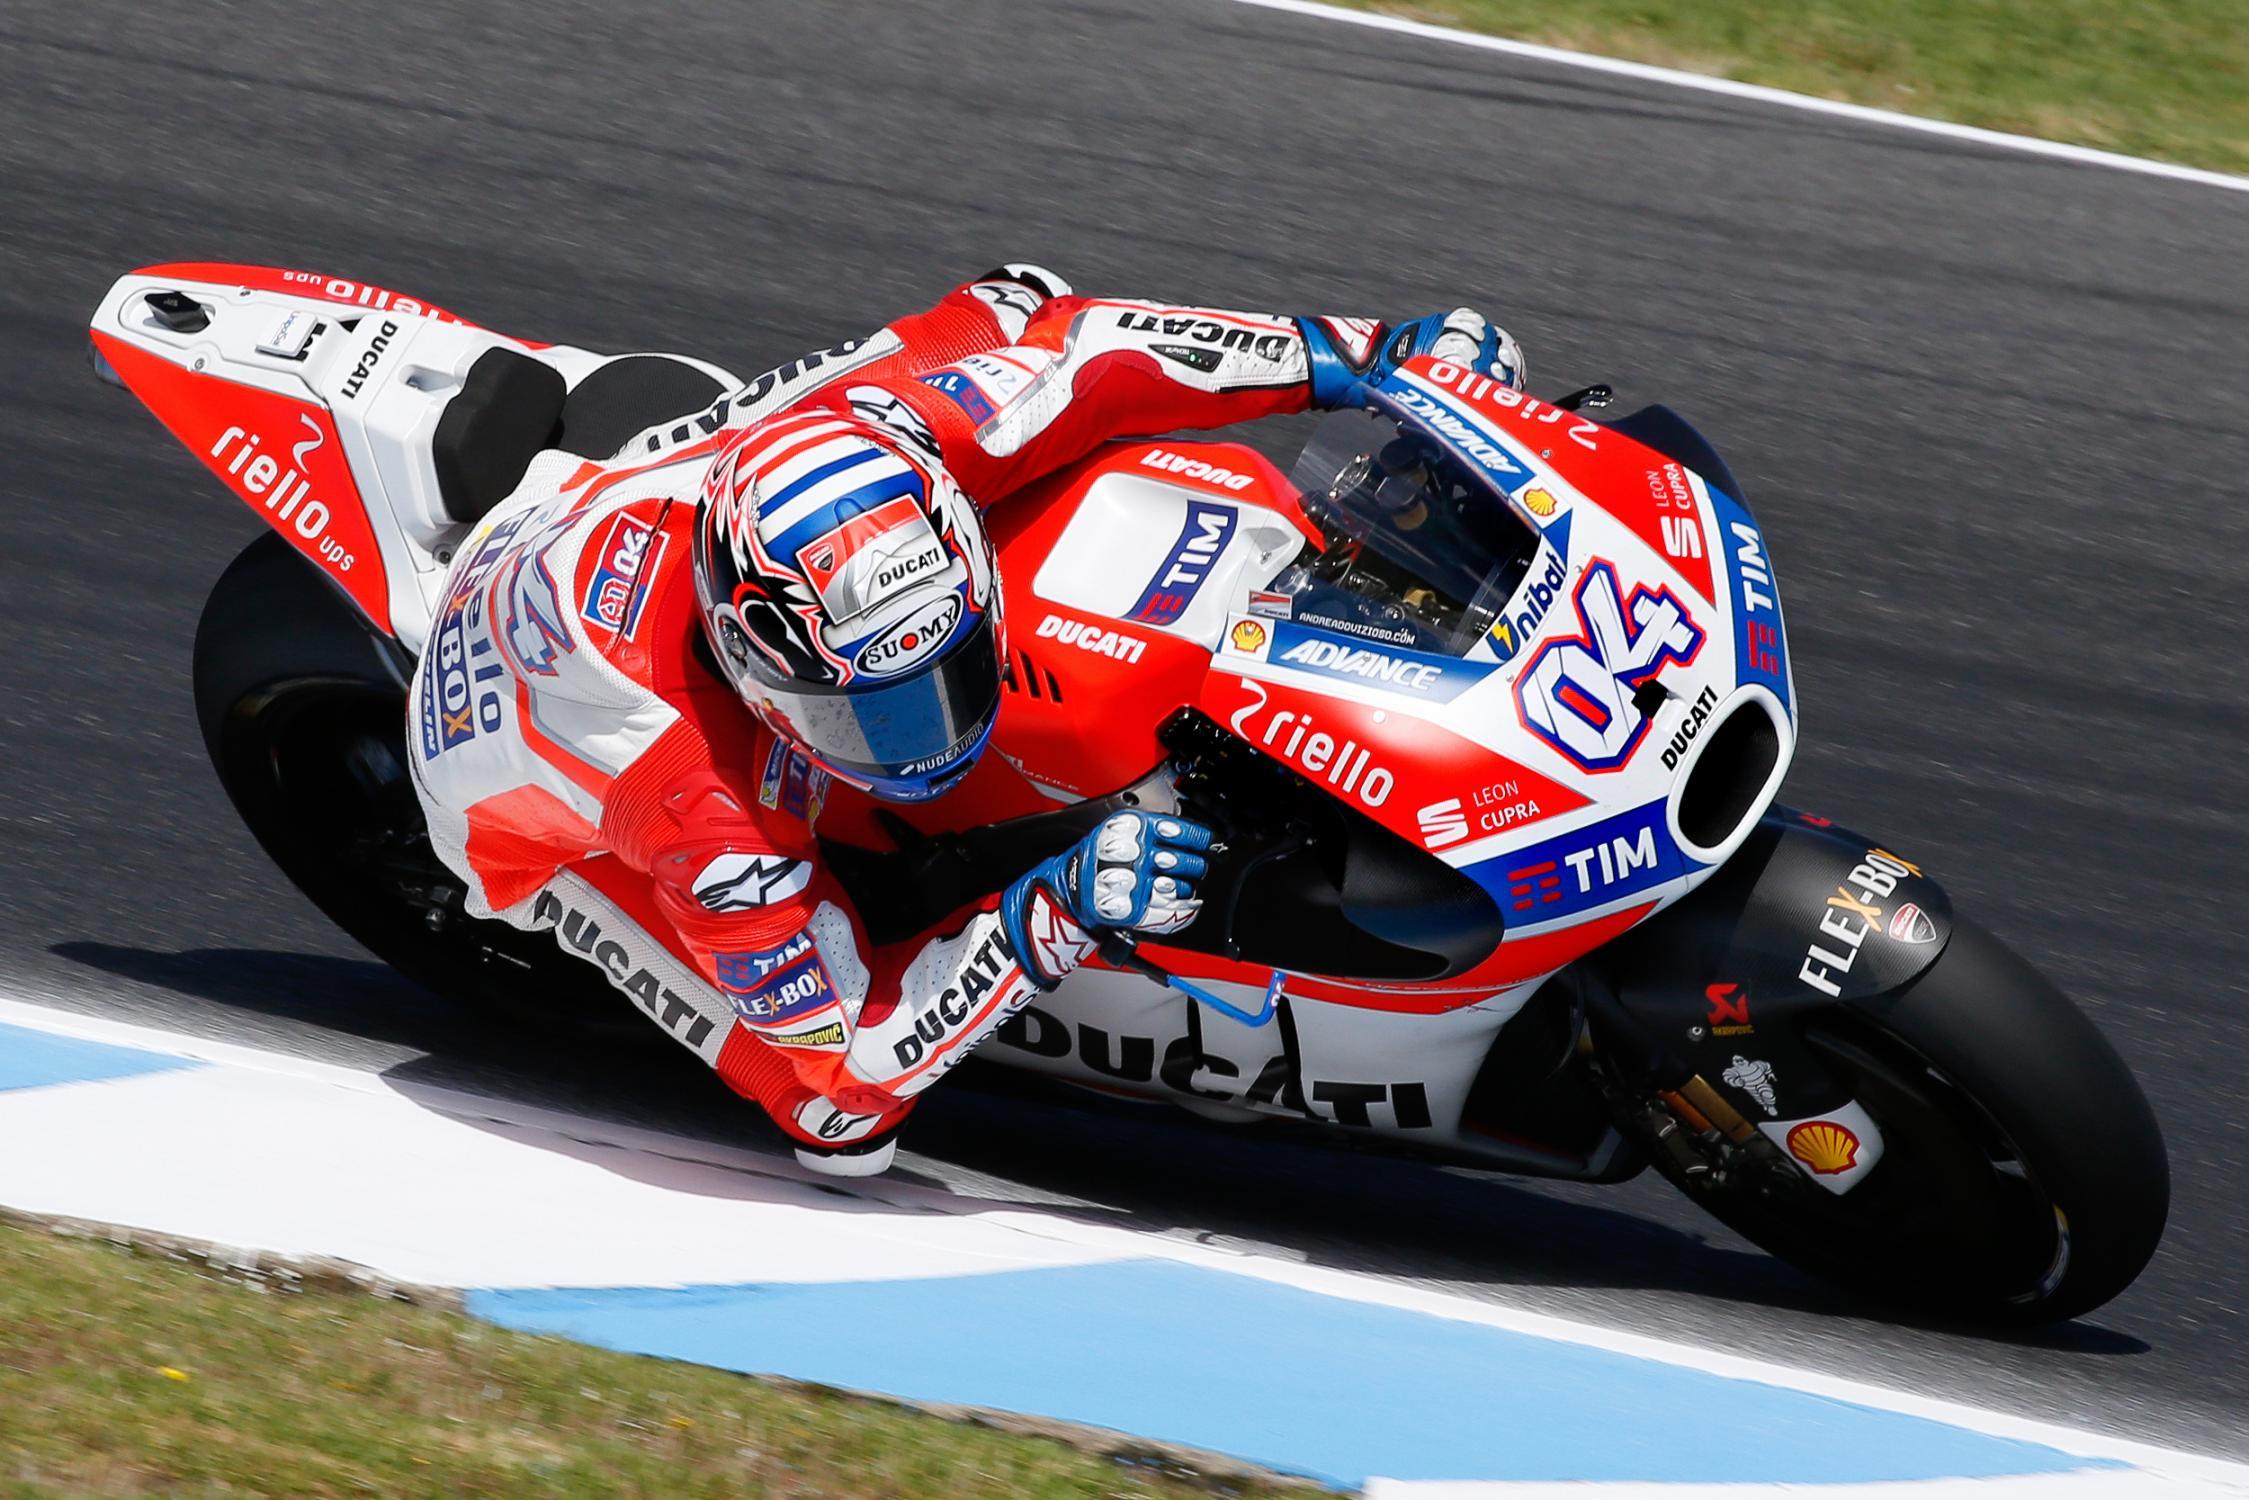 [MotoGP] Test Phillip Island 04-andrea-dovizioso-ita_tp23230.gallery_full_top_fullscreen